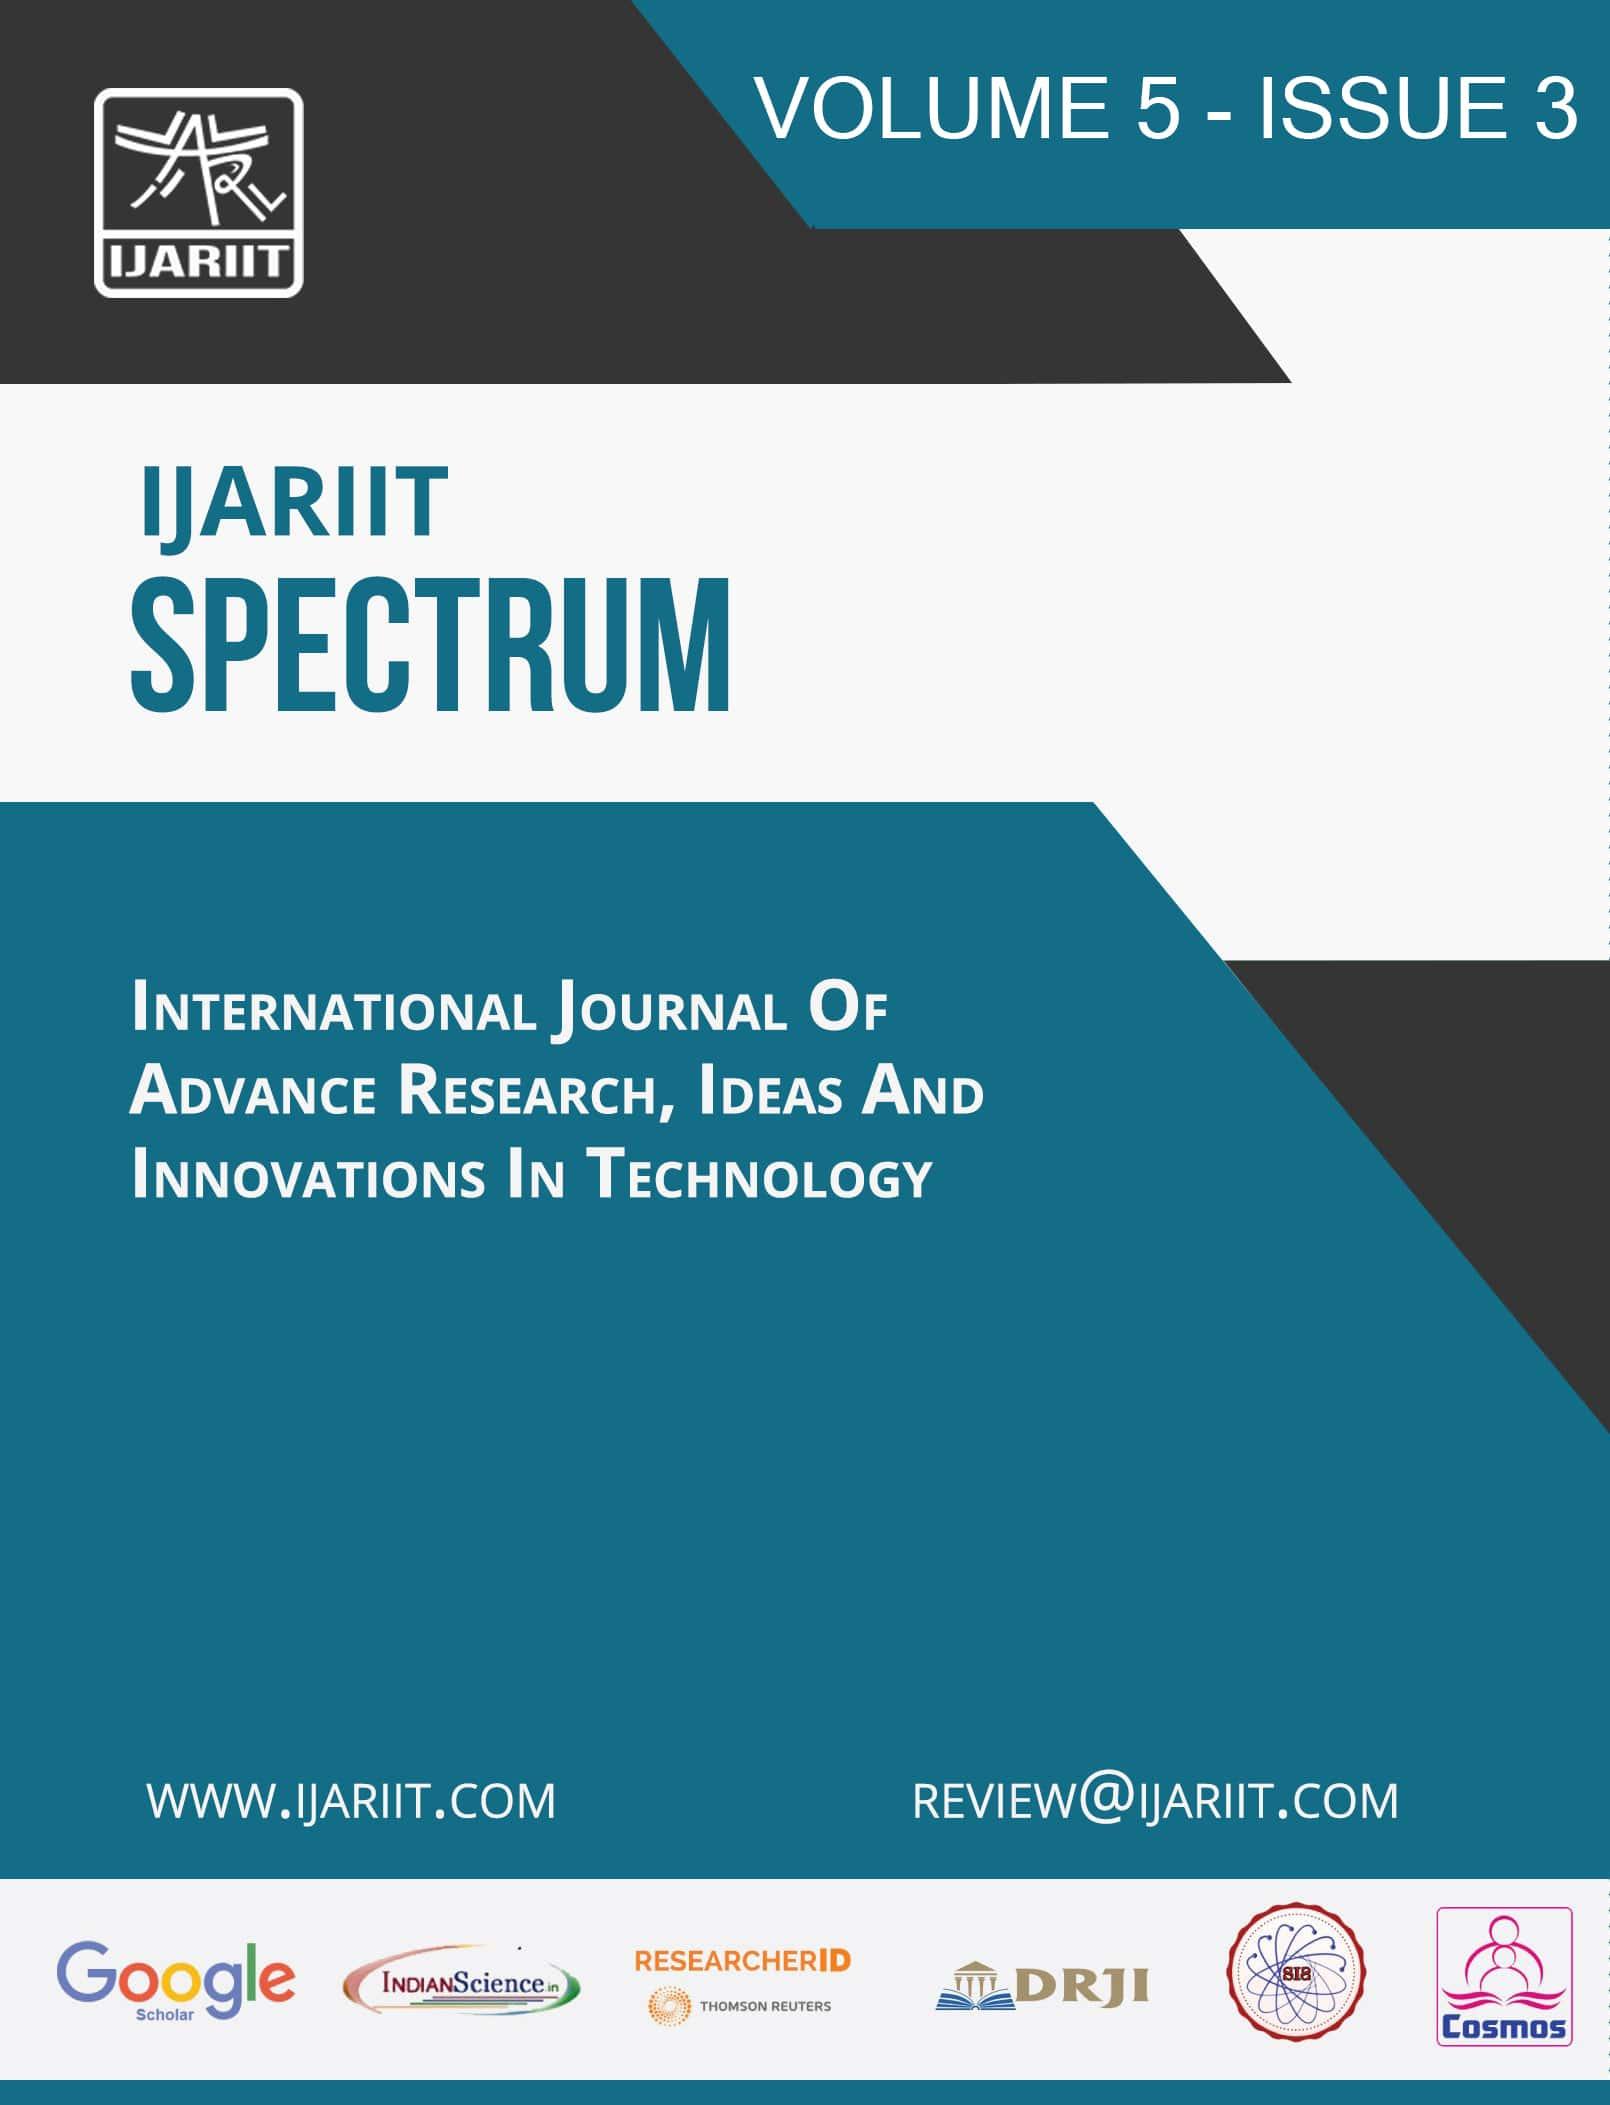 Edition: Volume-5, Issue-3 - IJARIIT